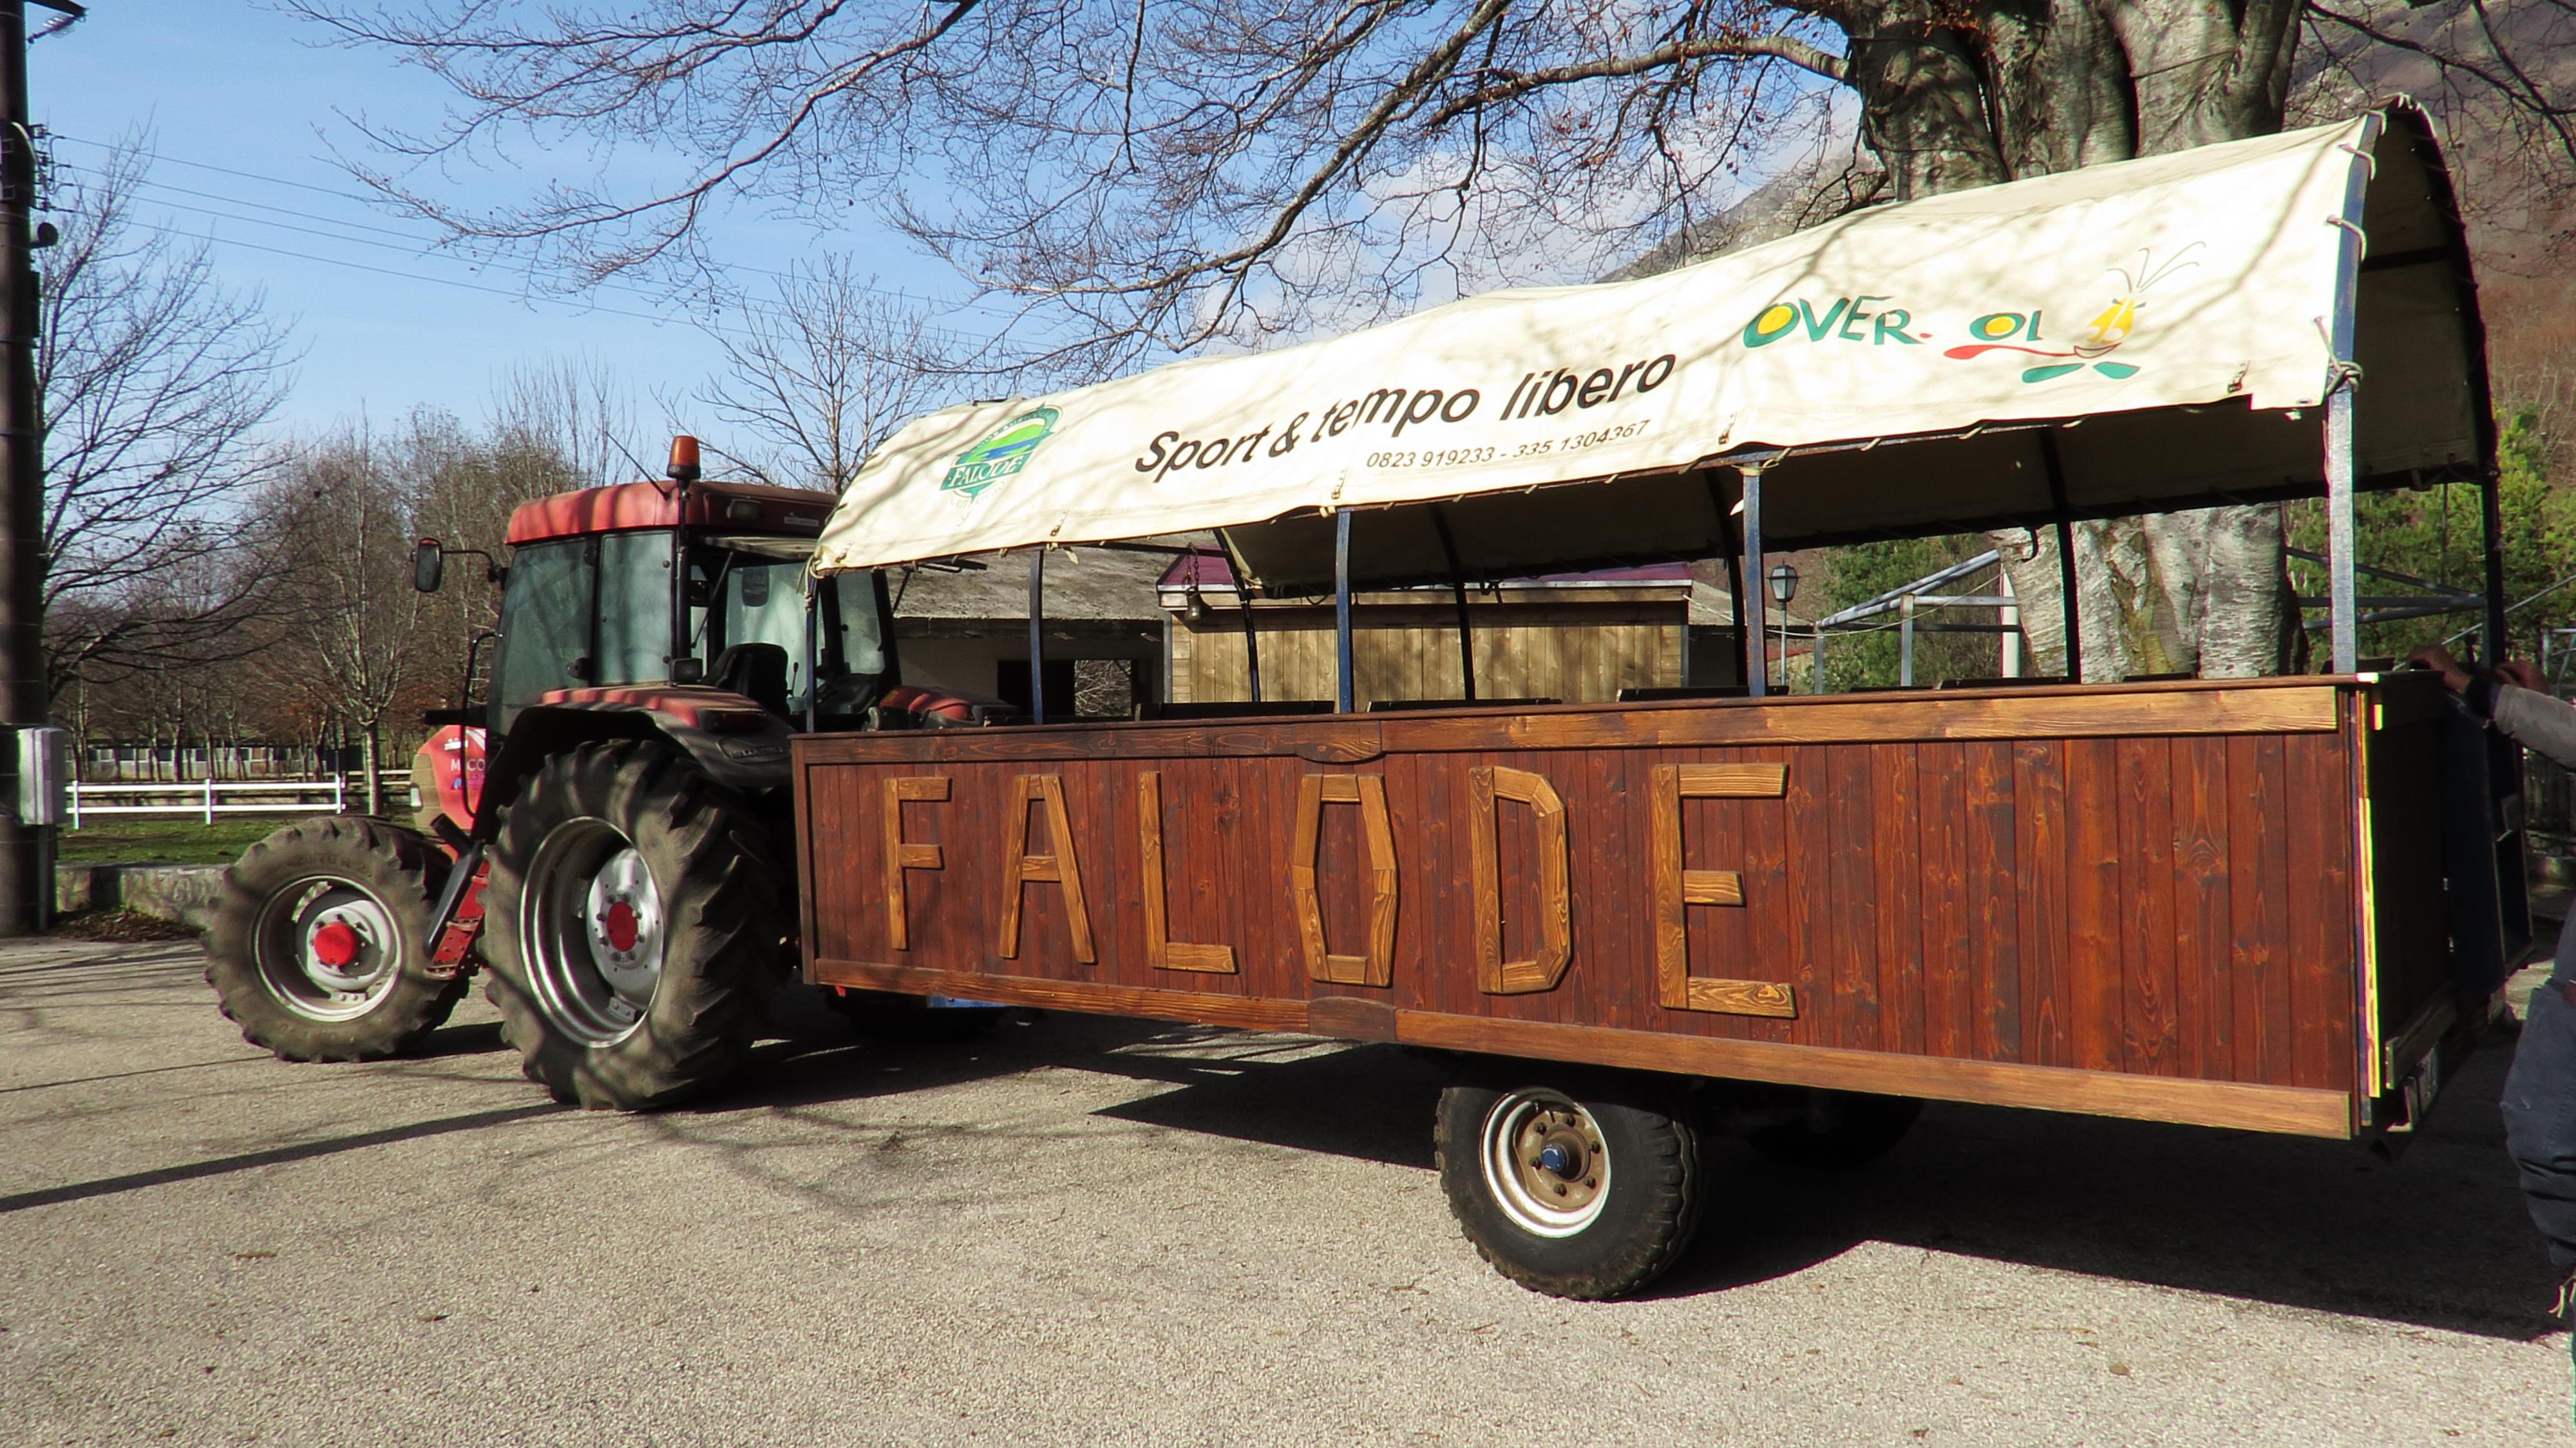 Caravan Falode